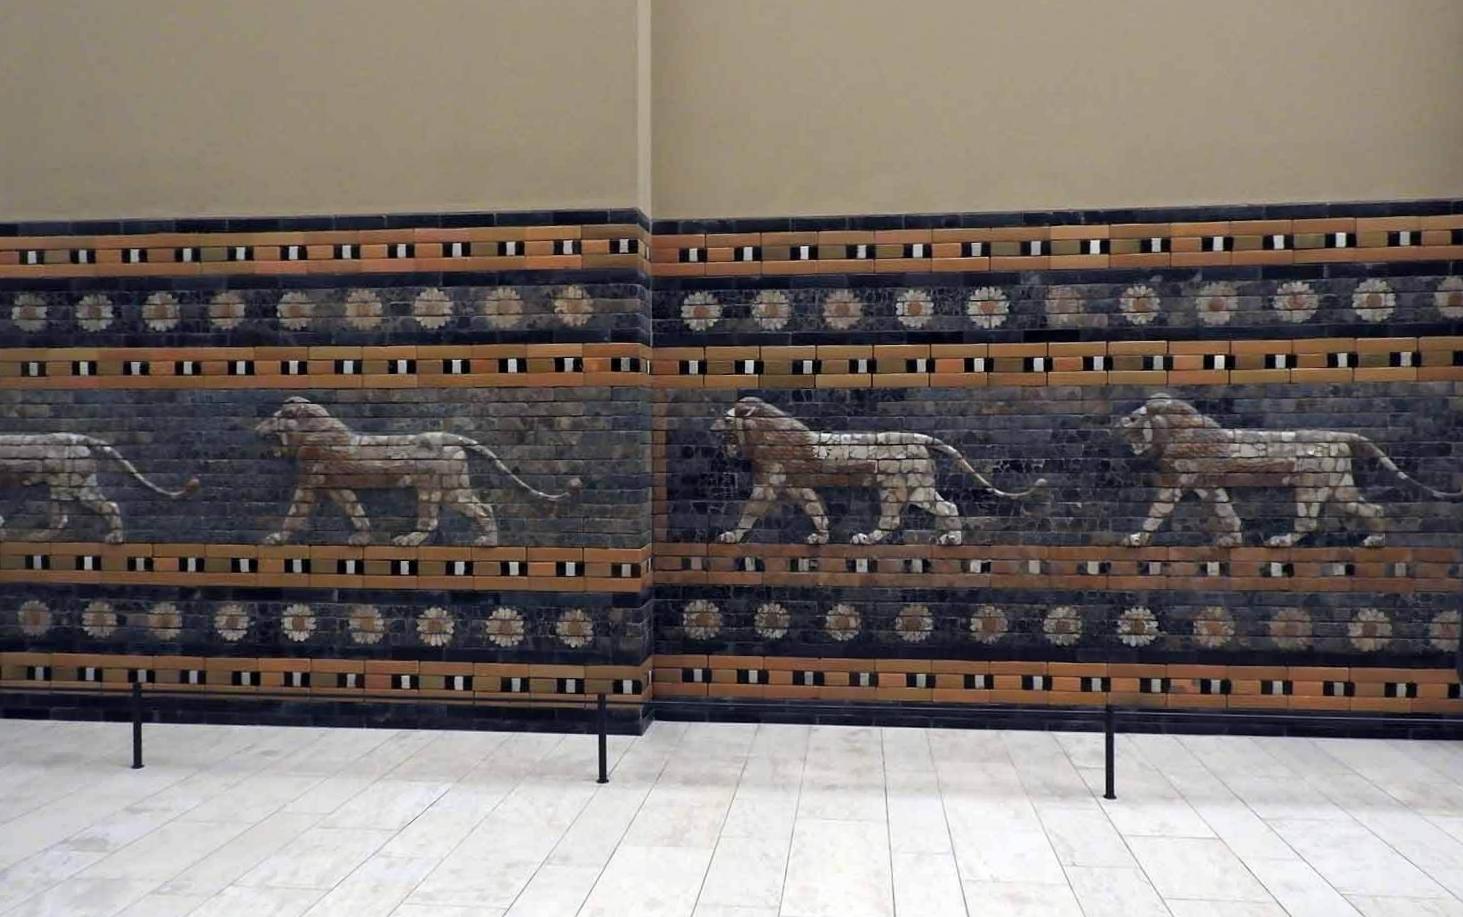 germany-berlin-pergamon-museum-blue-tile-lions-hallway.JPG